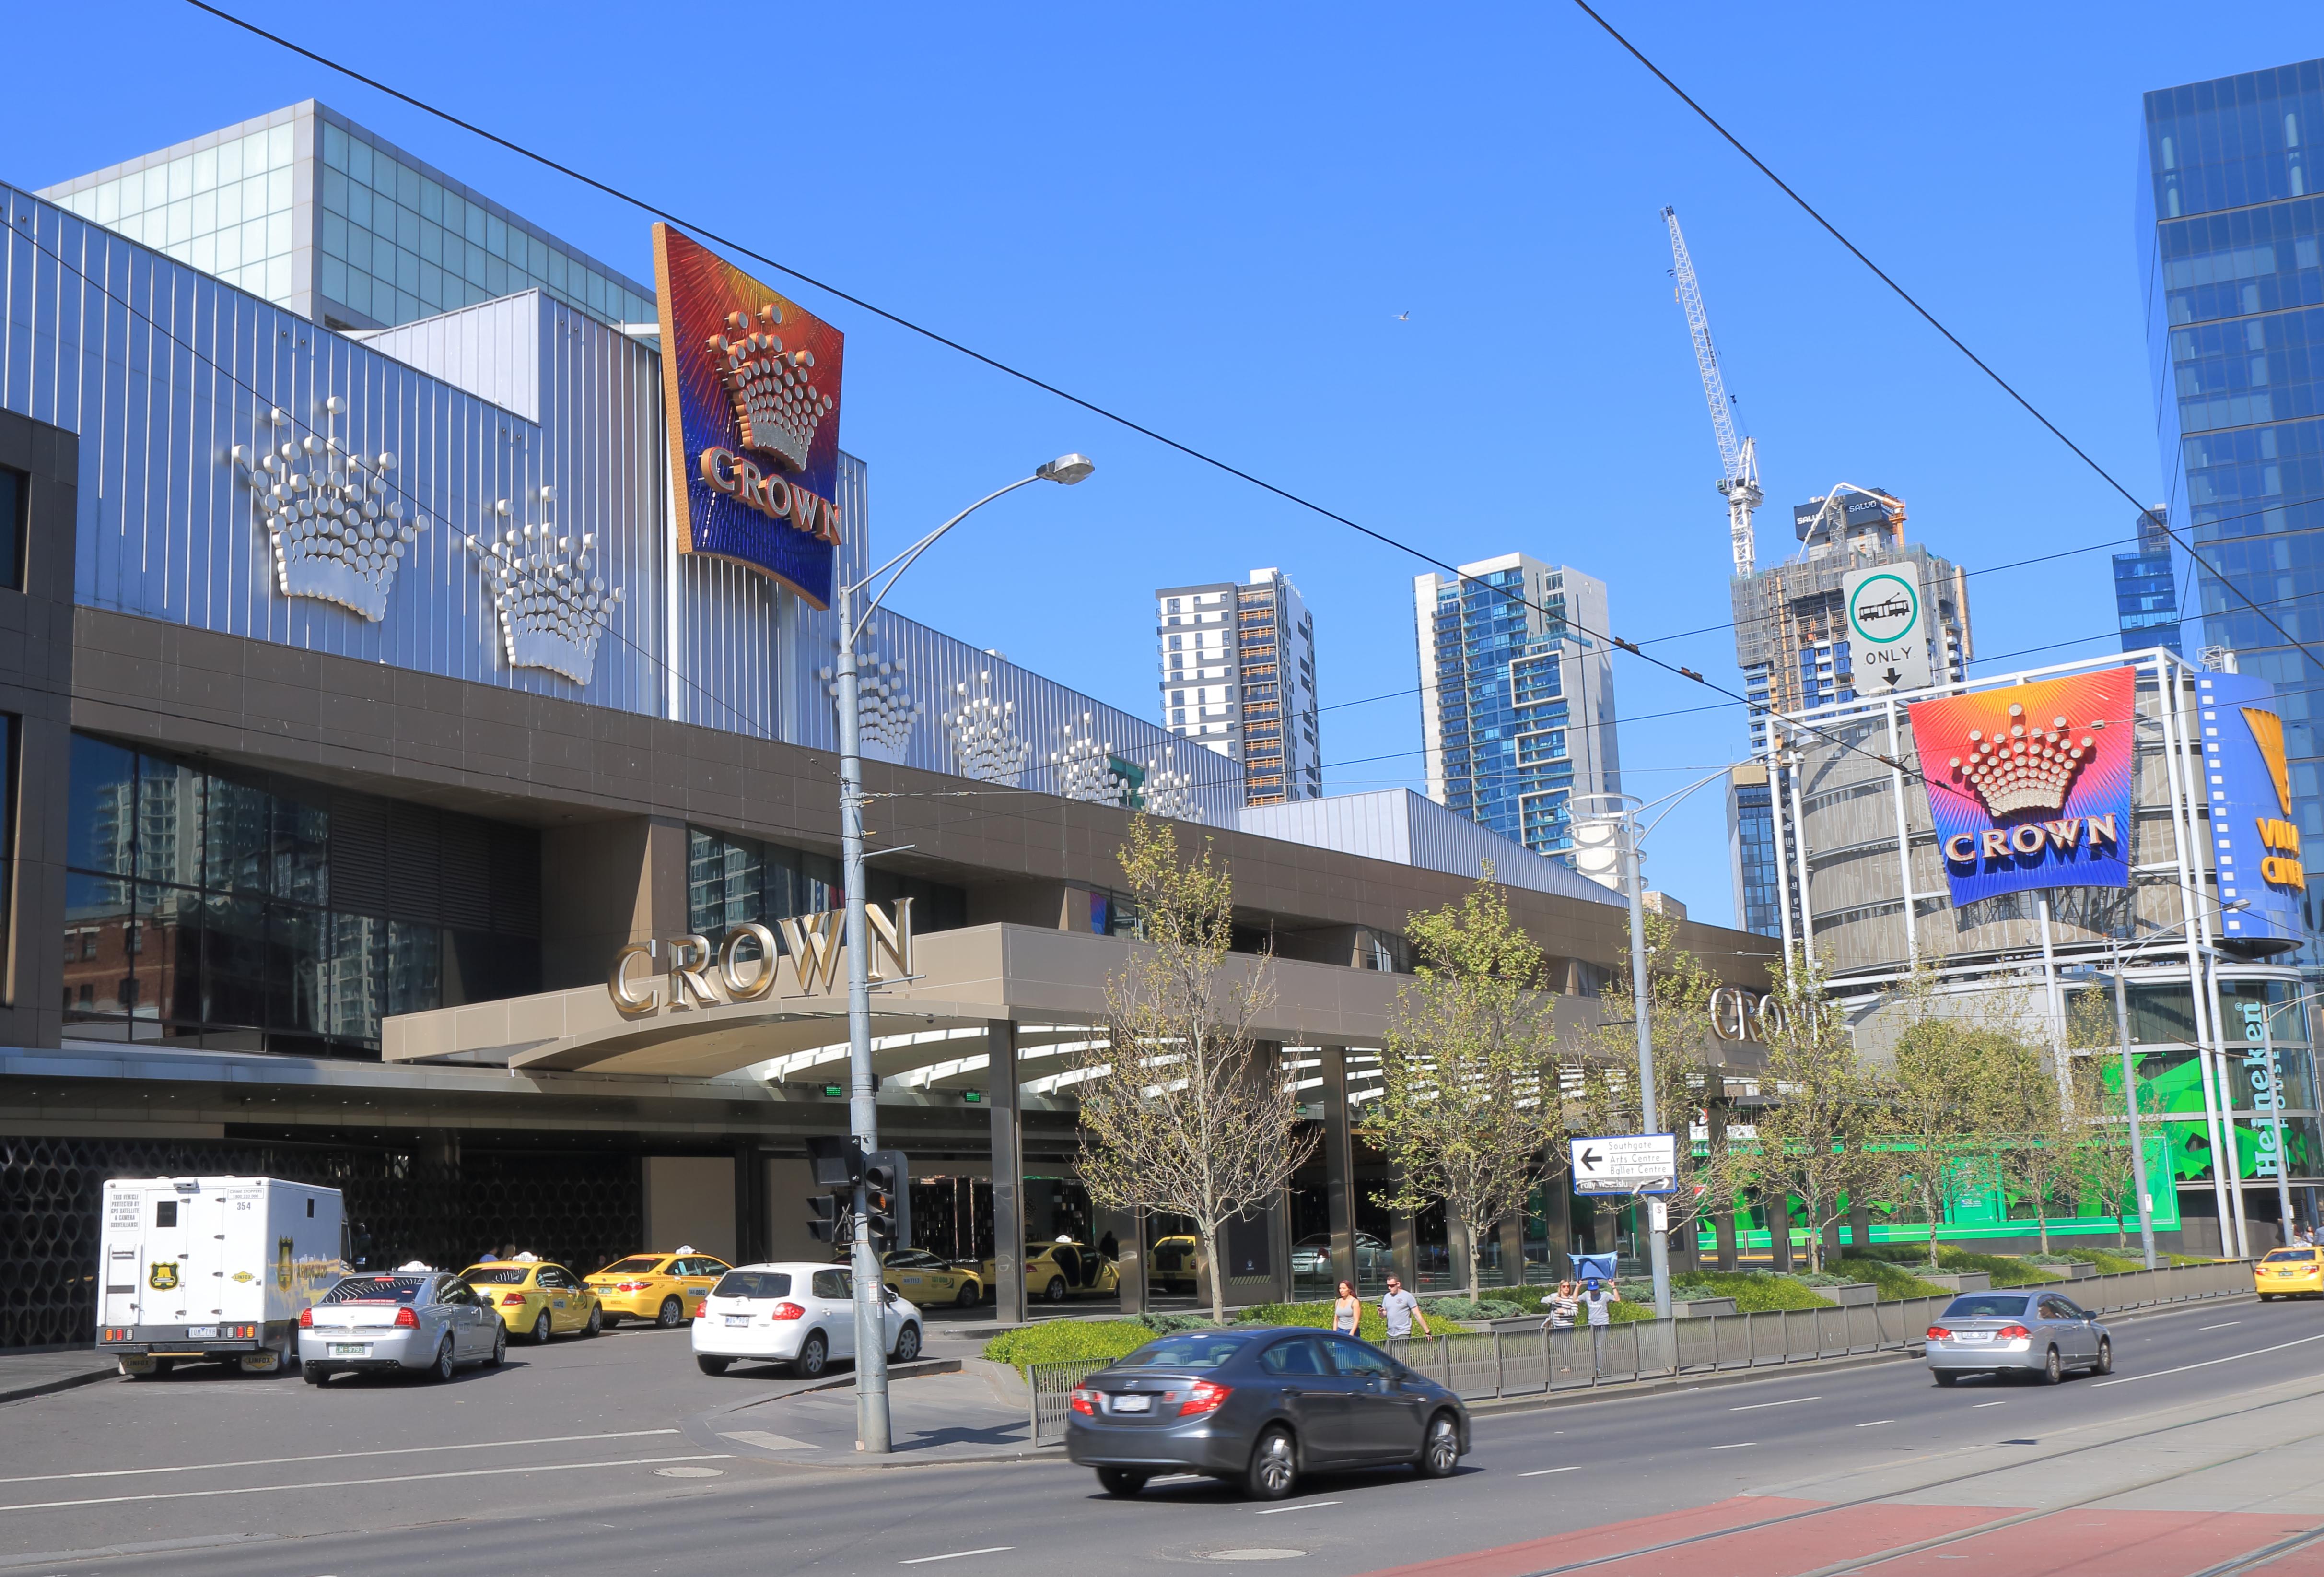 Crown Casino Jobs Melbourne Australia